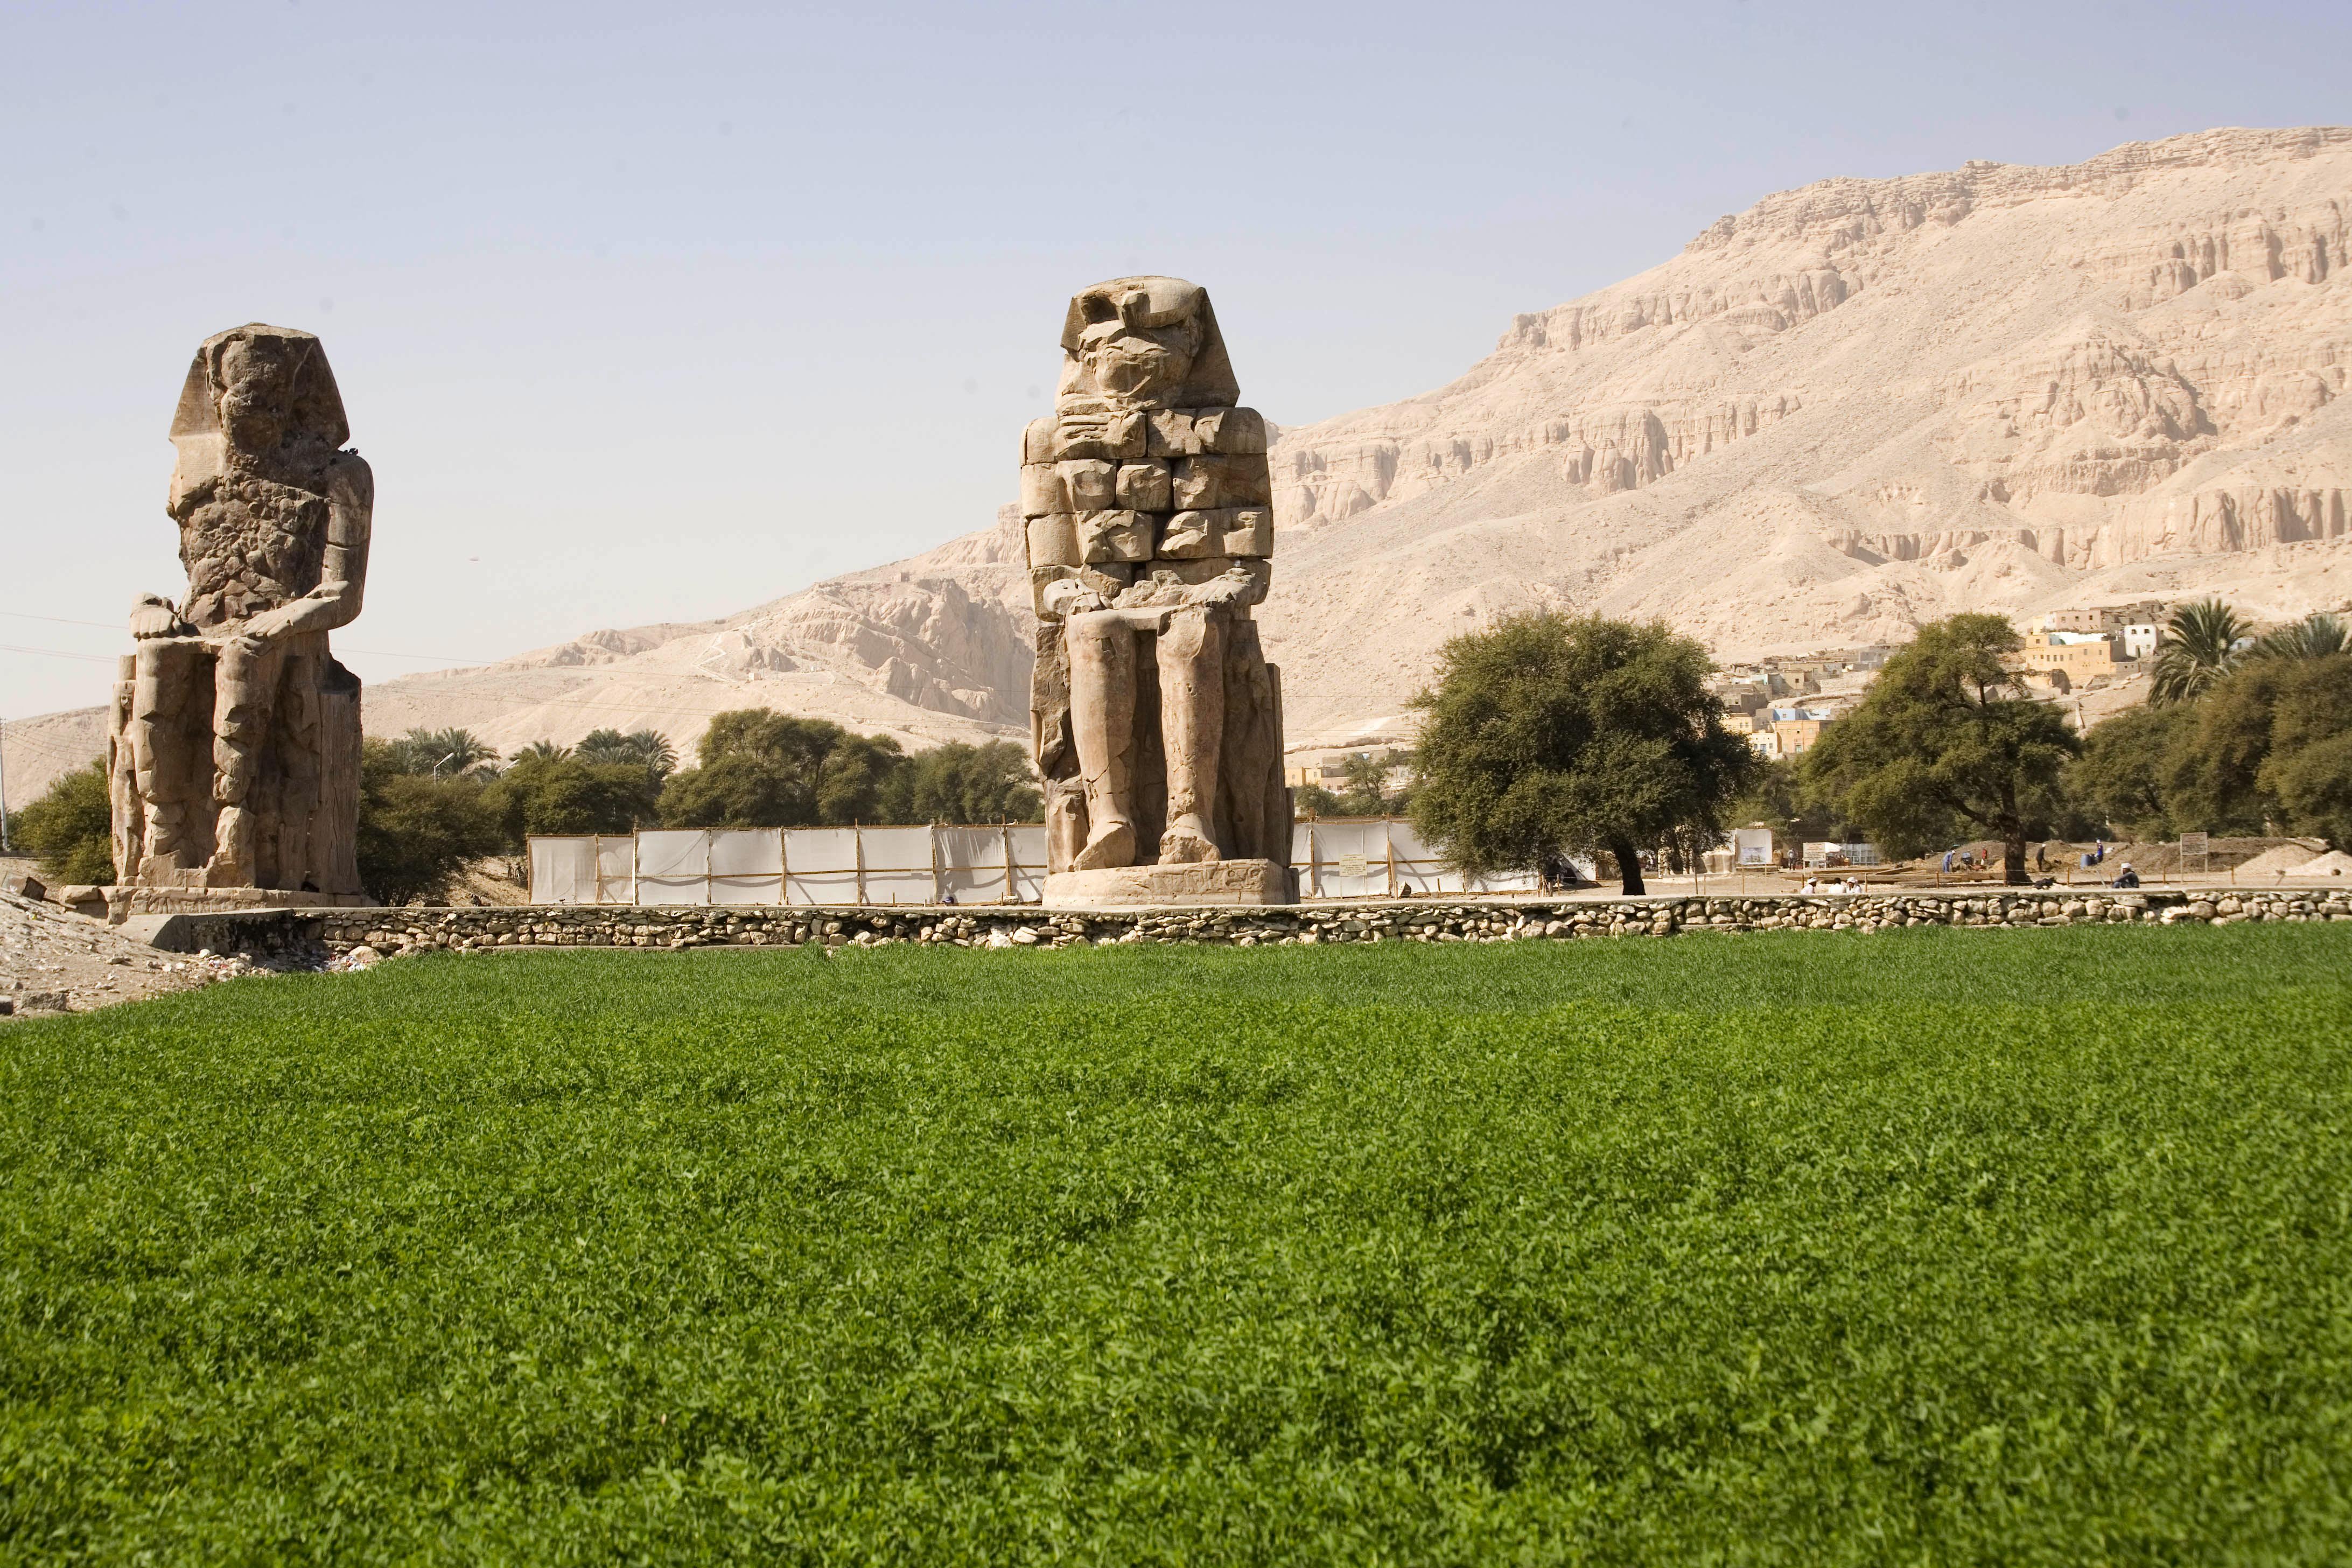 Lush alfalfa field on Nile bank carpets ancient Pharaoh monument